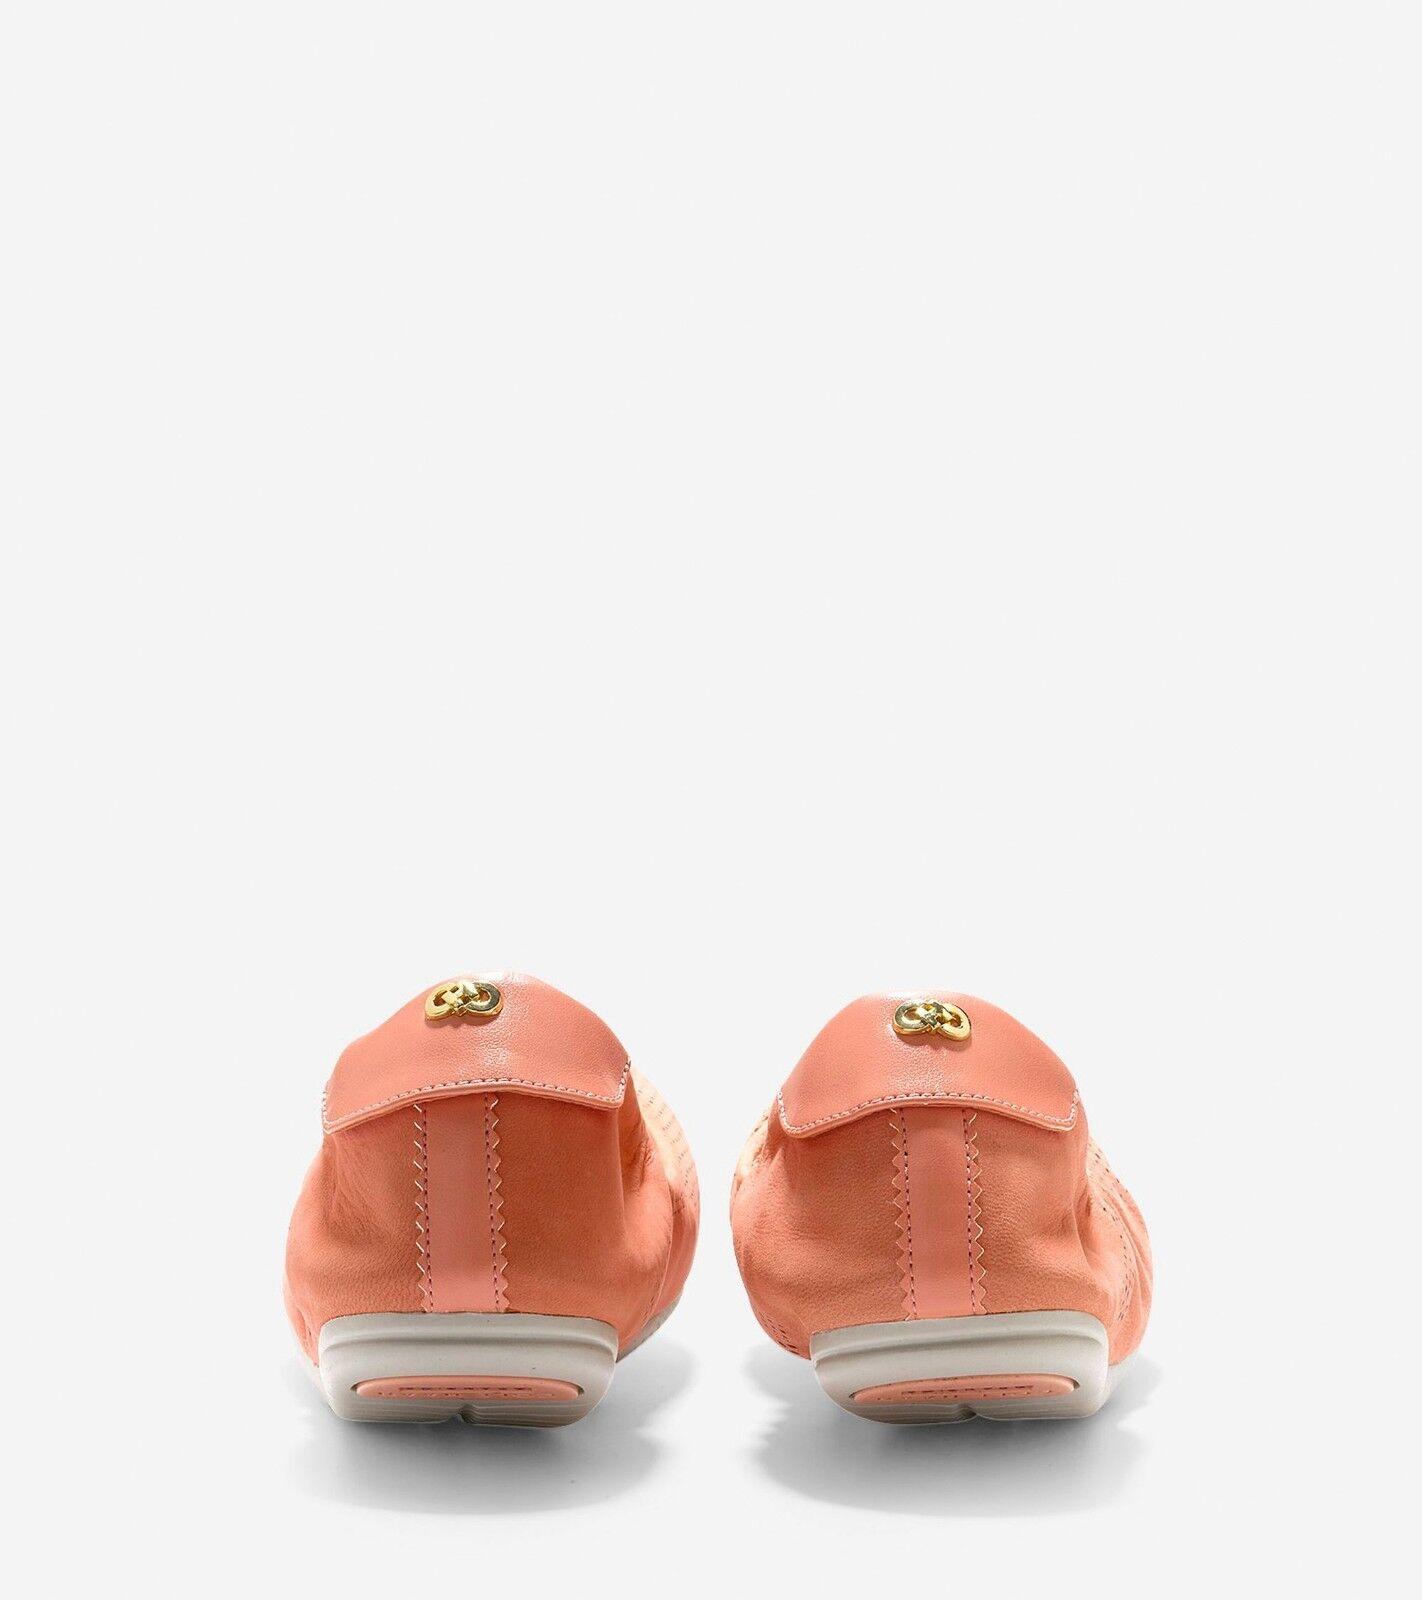 NEW NEW NEW Cole Haan StudioGrand Ballet Flat Size 7.5 b681d2